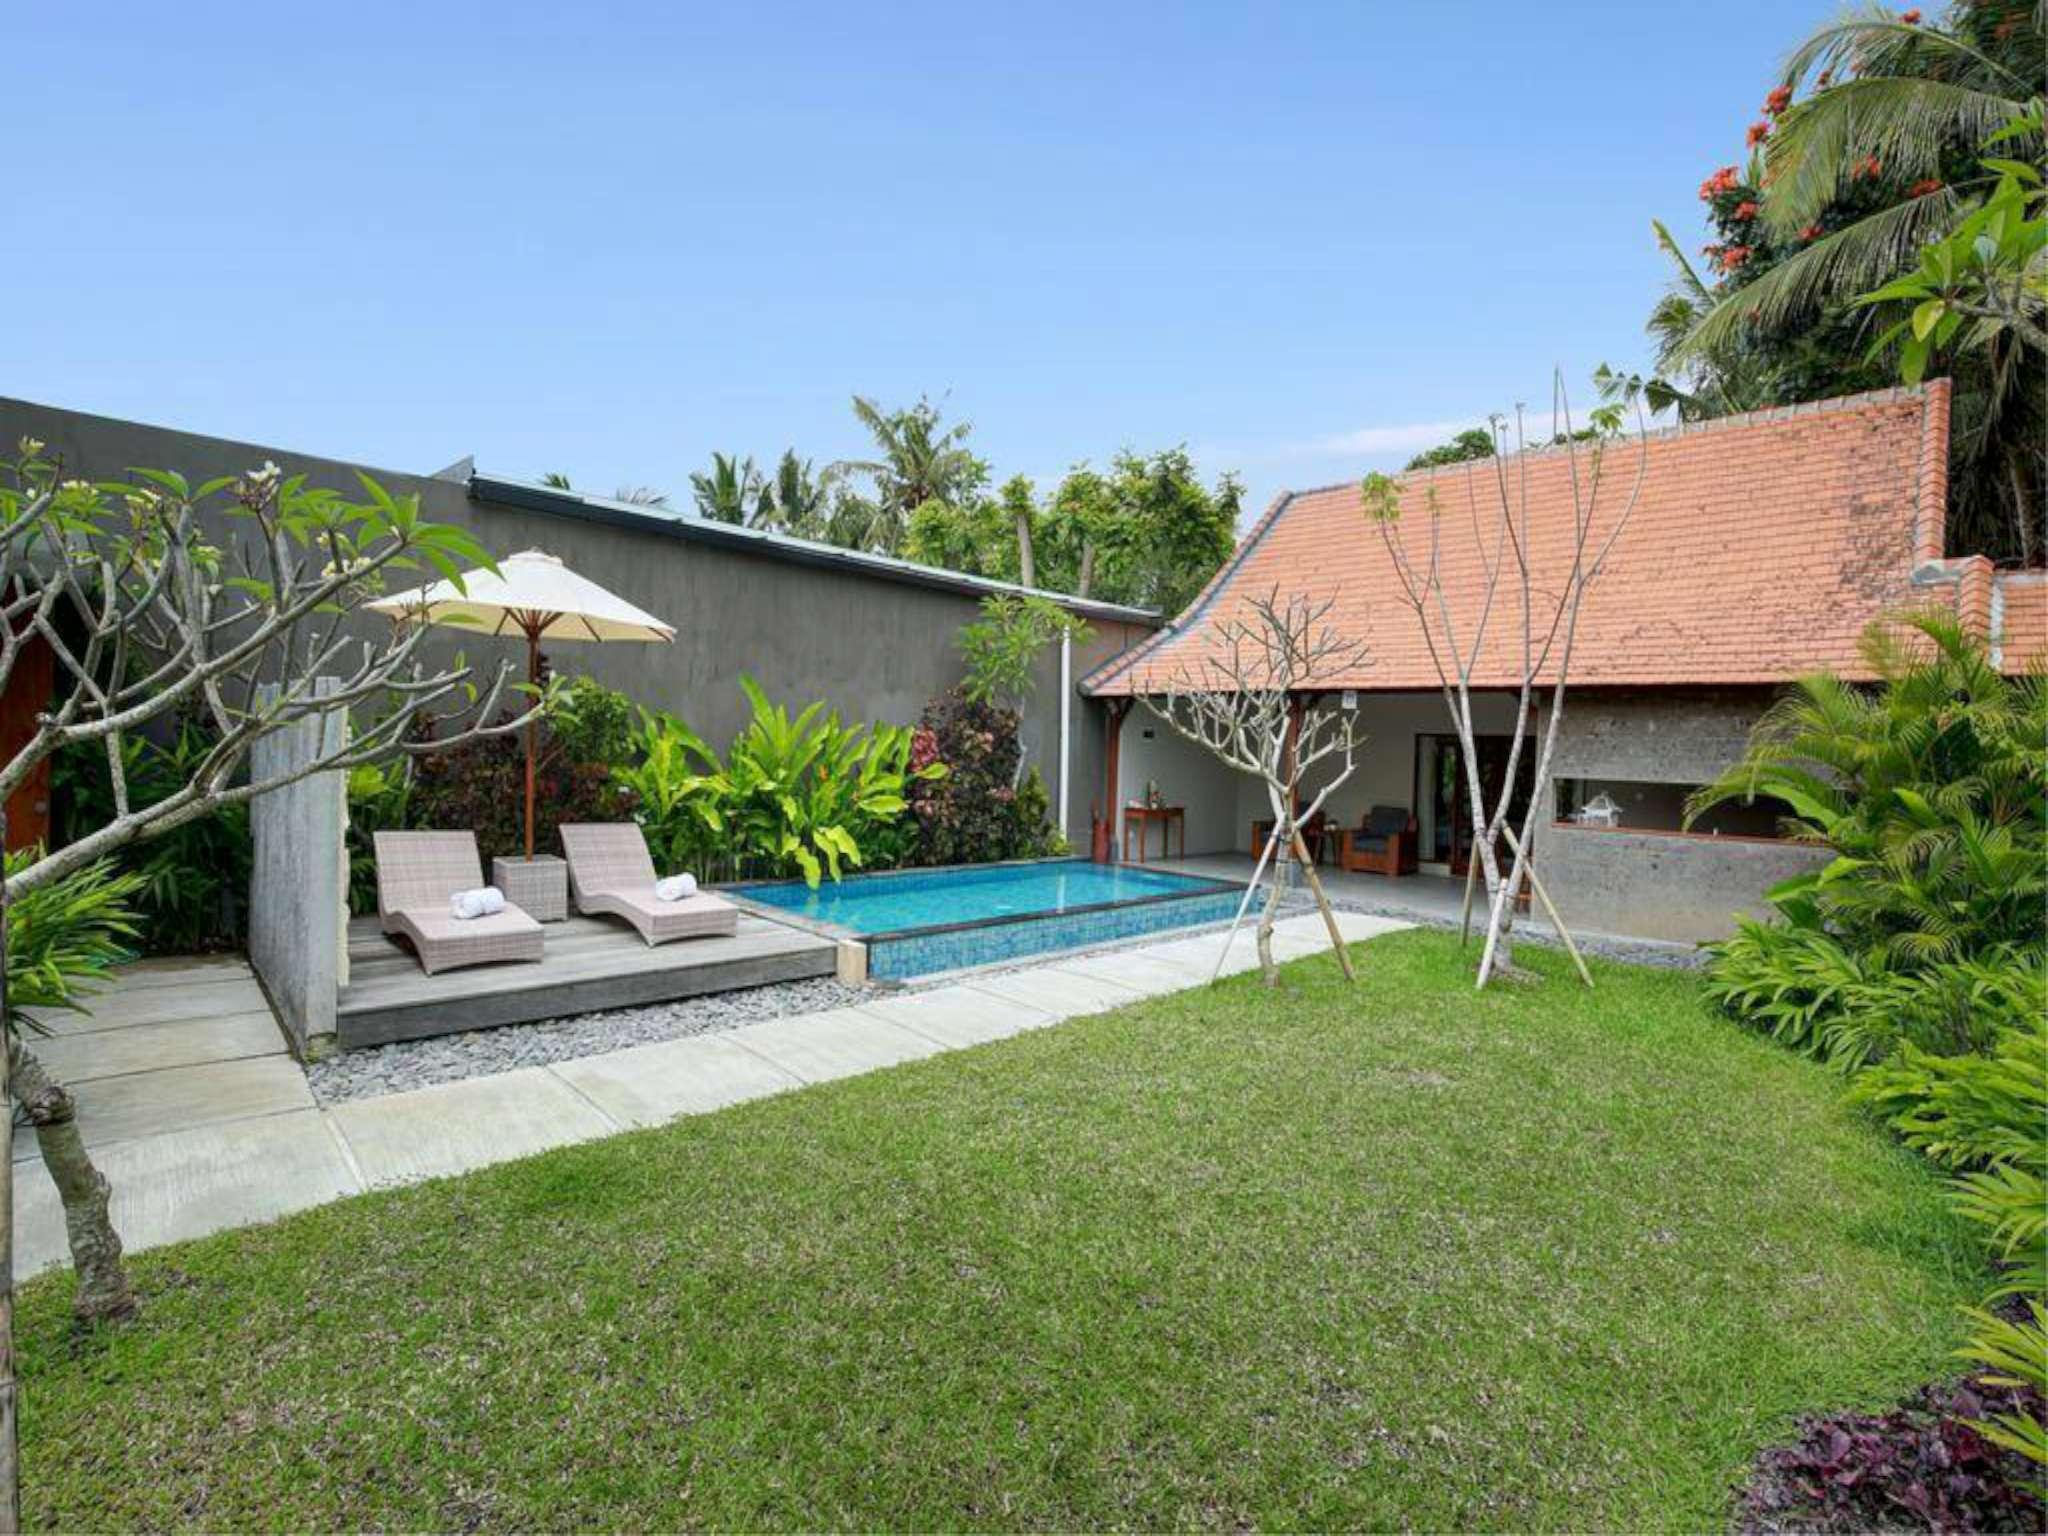 1 BDR Sativa Villas Ubud Private Pool